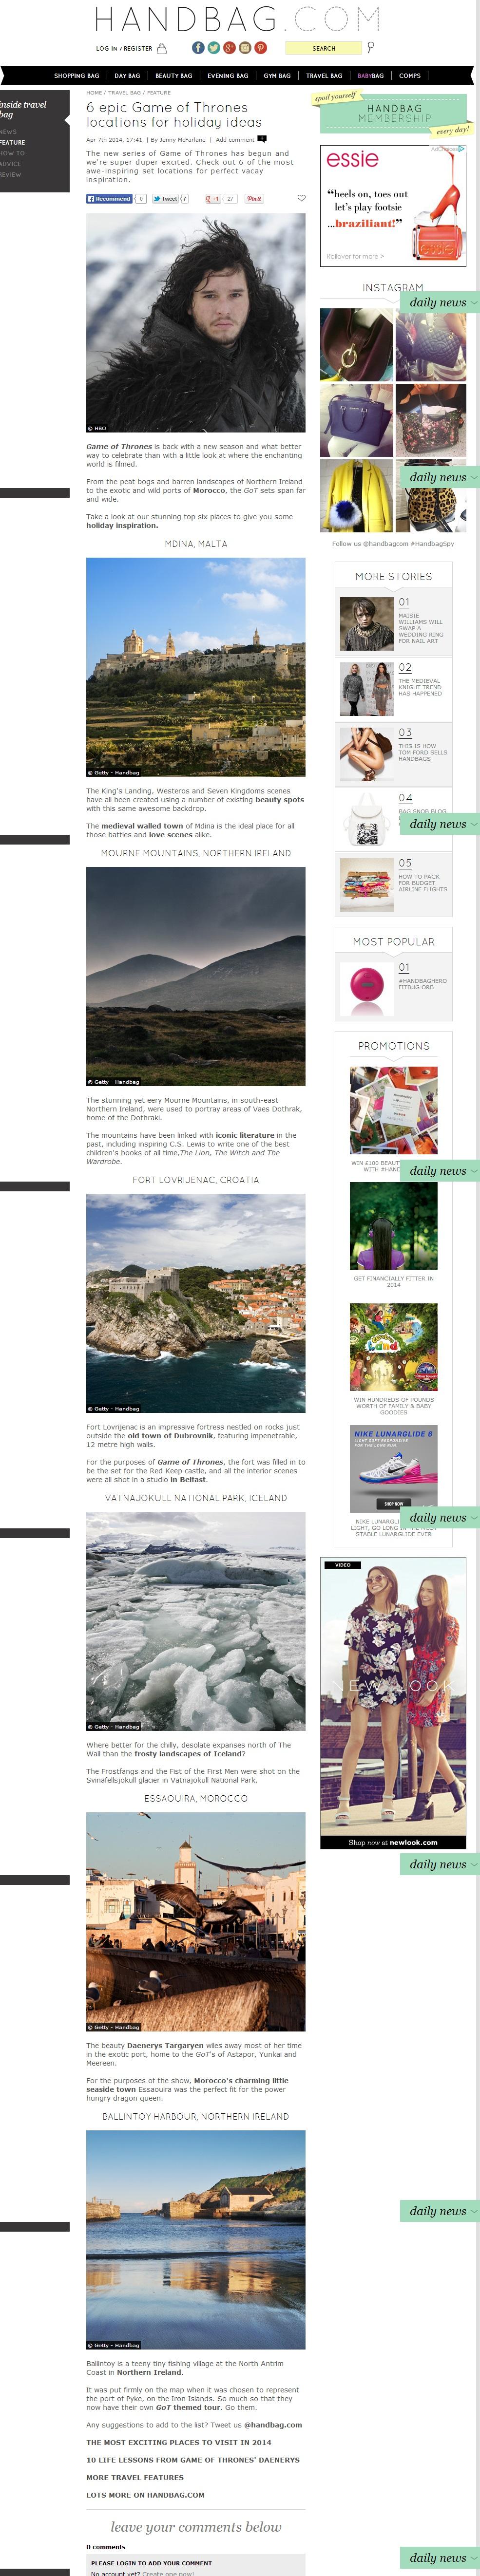 screencapture-www-handbag-com-travel-bag-feature-a562954-6-epic-game-of-thrones-locations-for-holiday-ideas-html